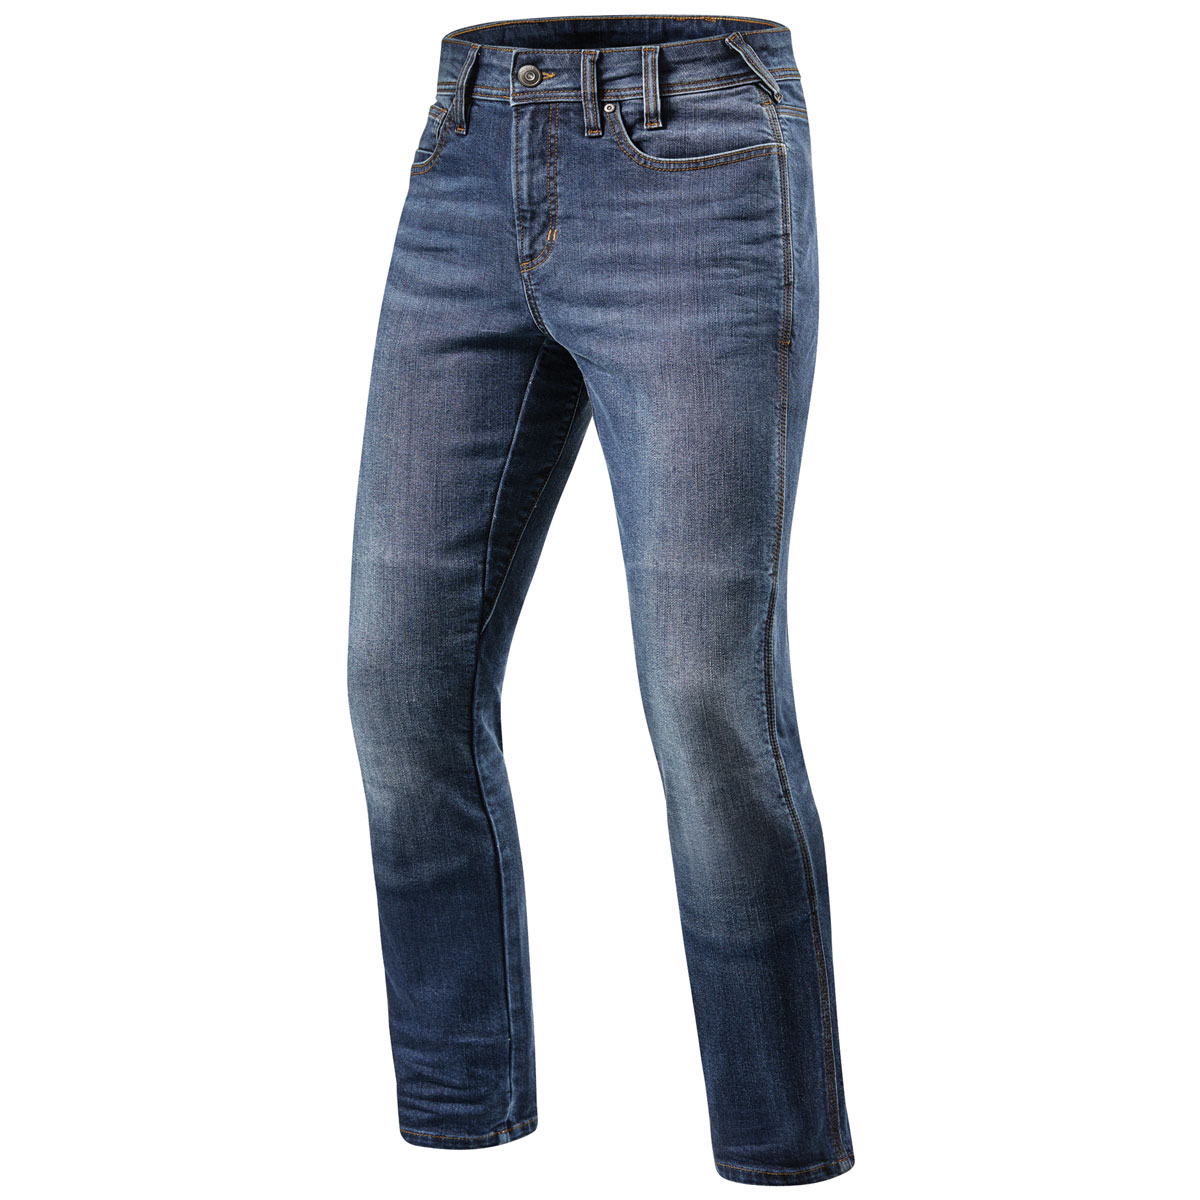 REV′IT! Men's Brentwood Slim Fit Light Blue Jeans